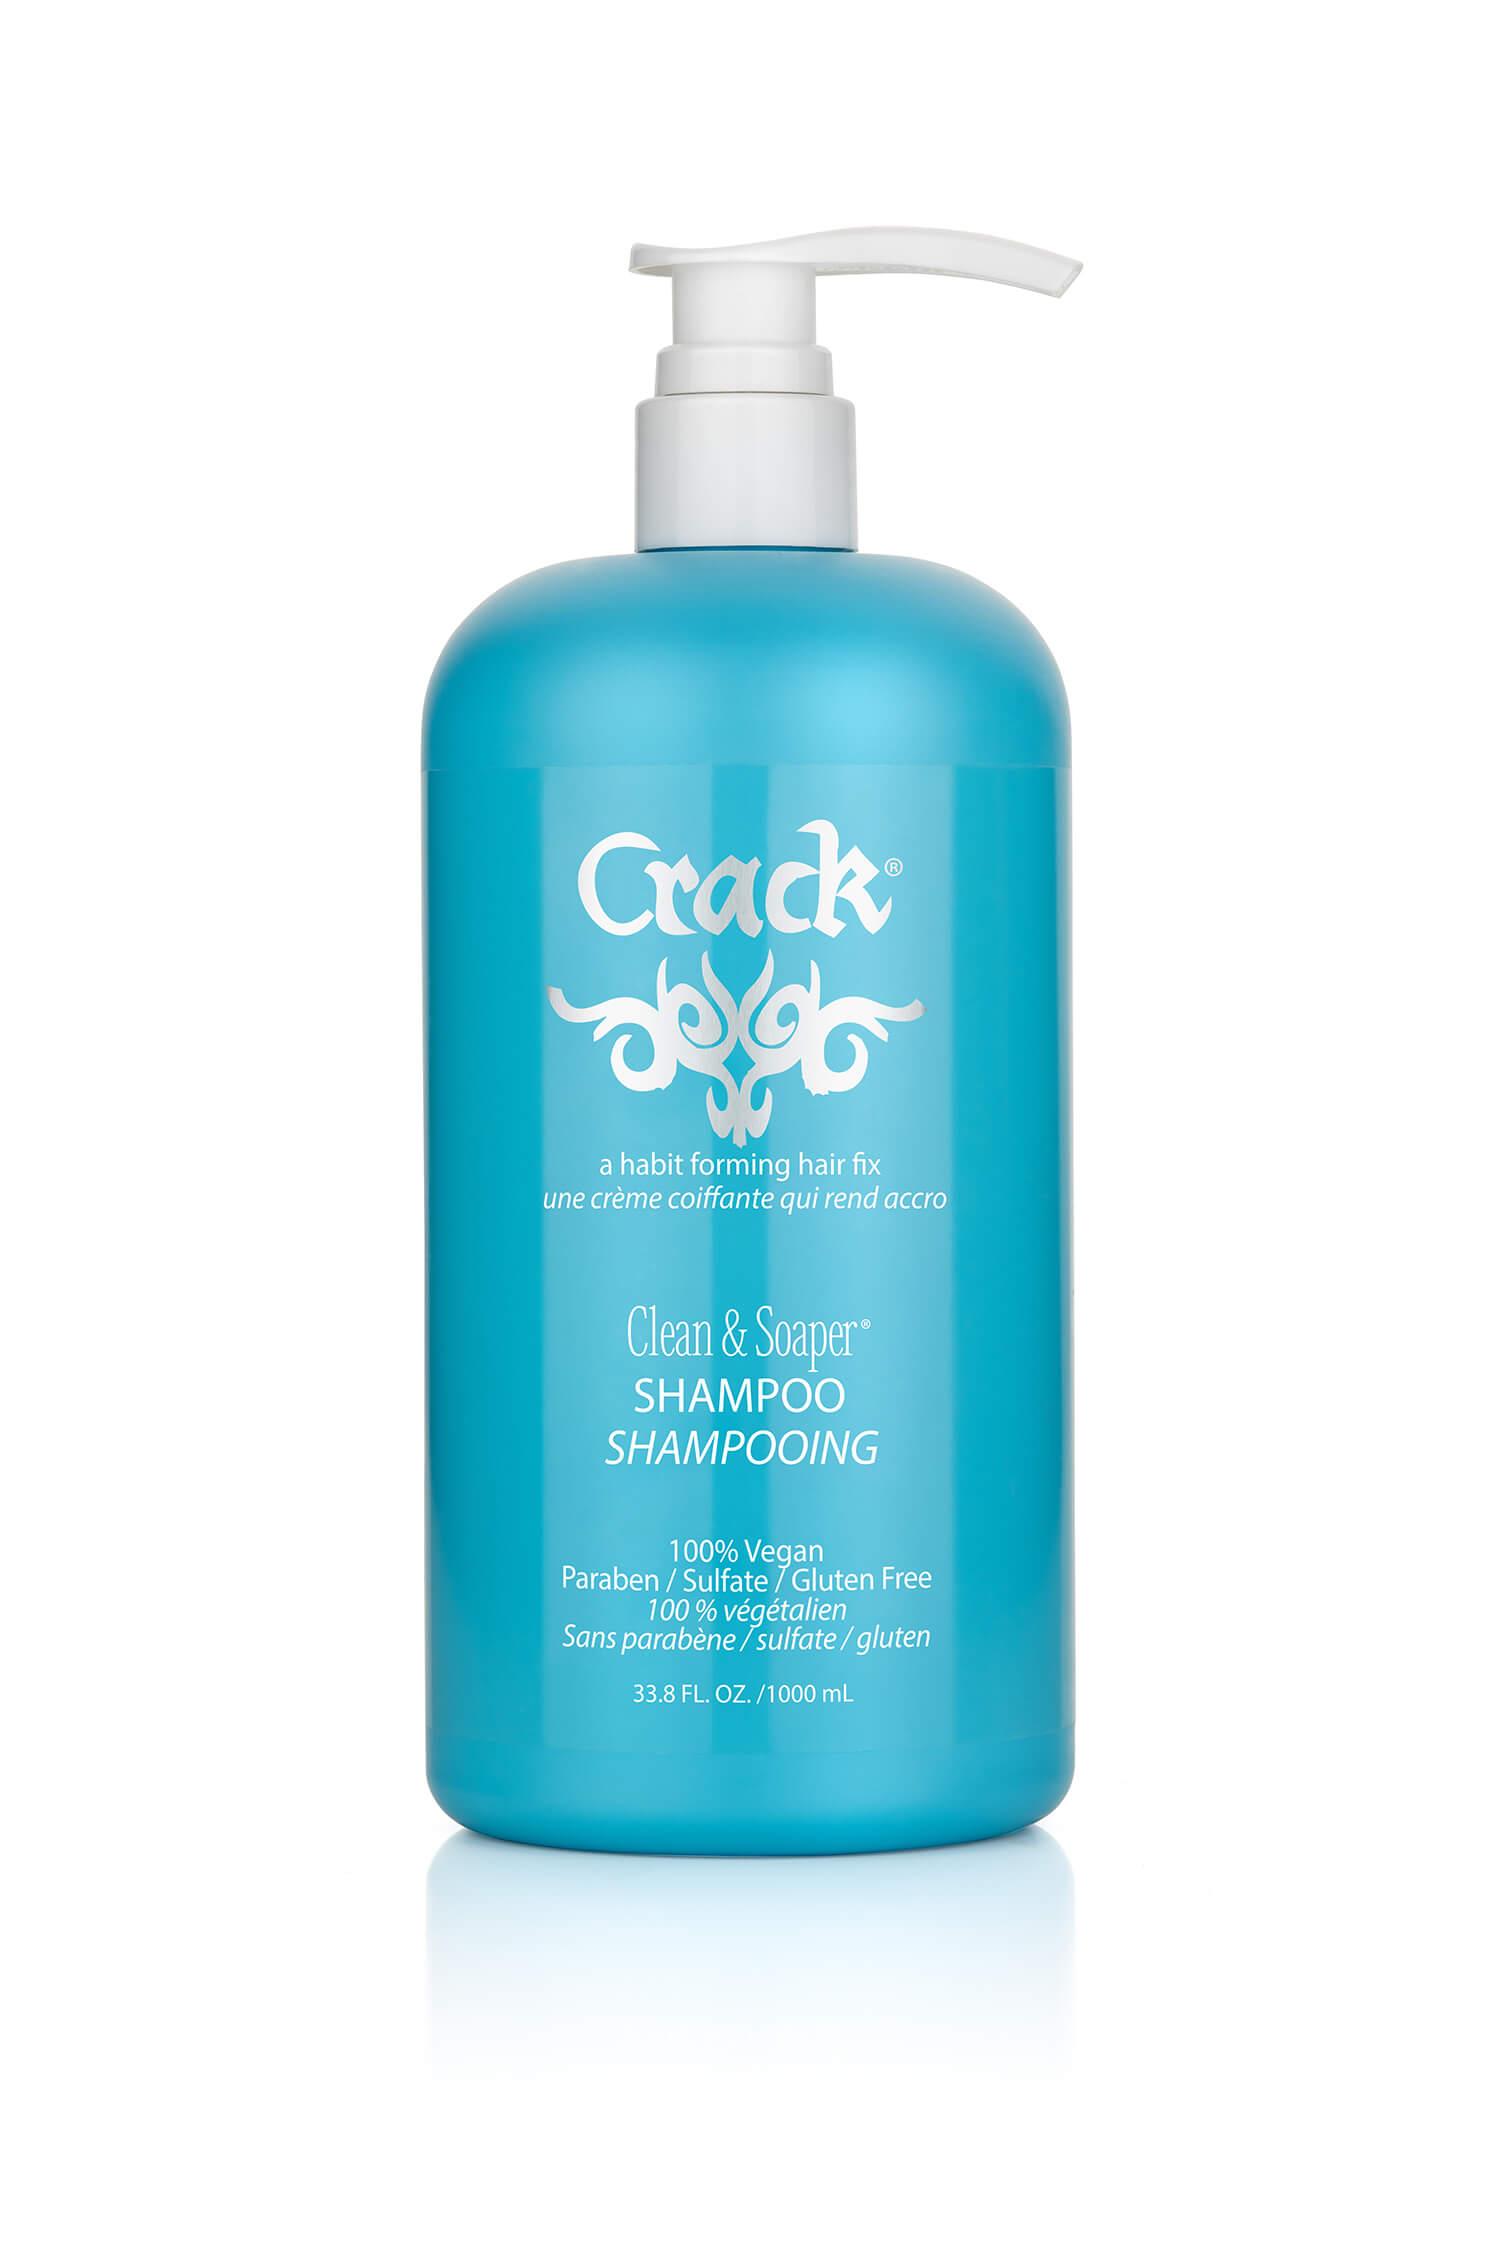 Crack Hair Fix Italia - Shampoo 1 lt